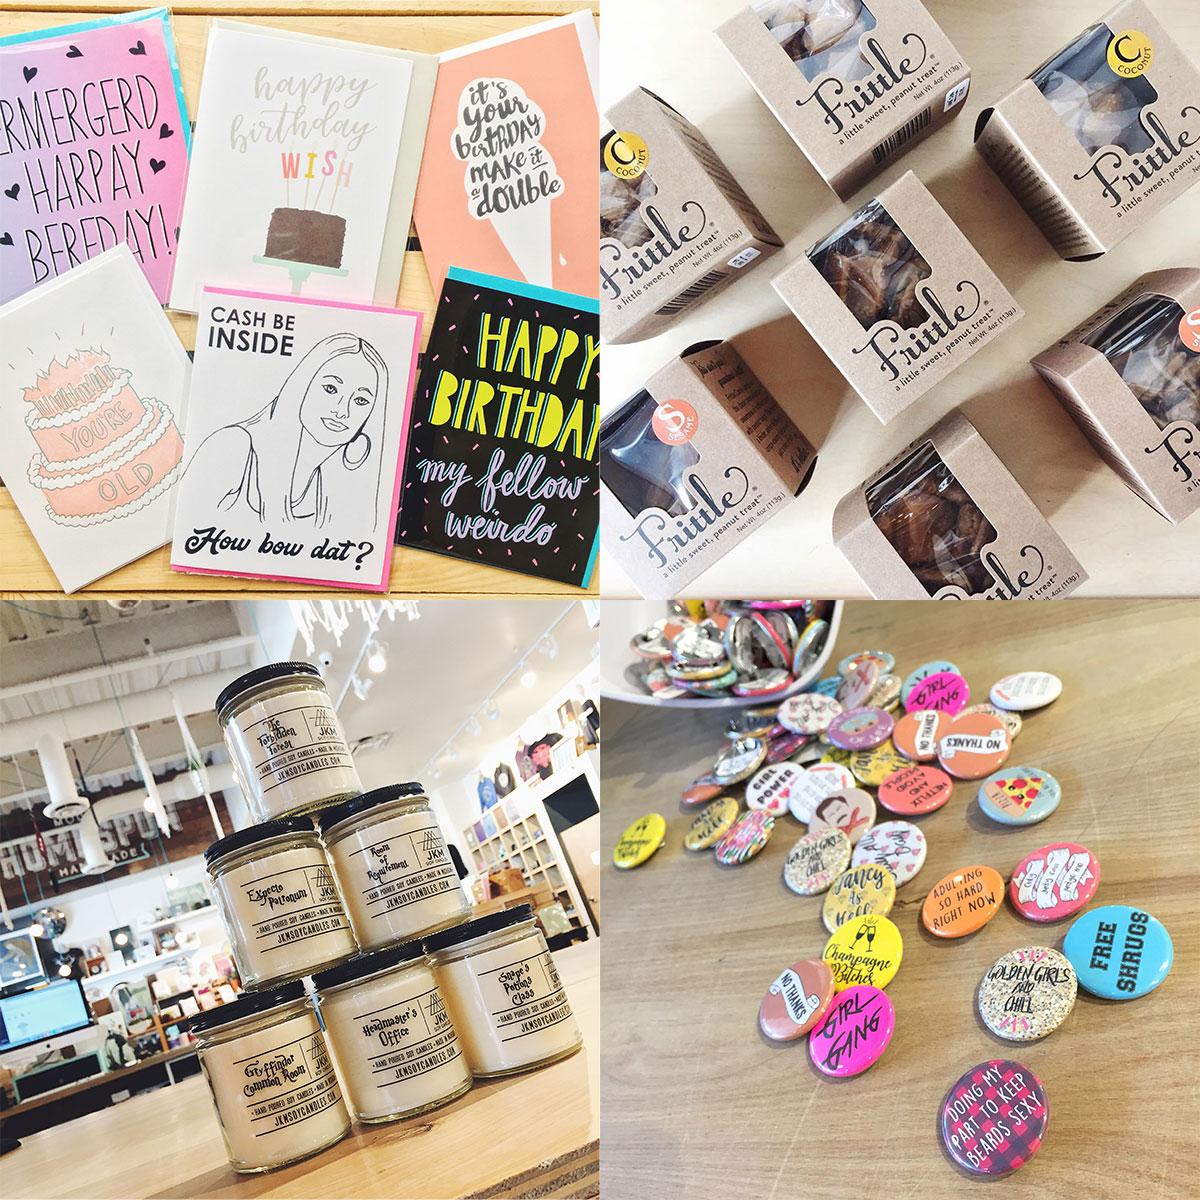 ICYMI April 13 shop handmade cards, artisanal foods, and novelties at Homespun: Modern Handmade